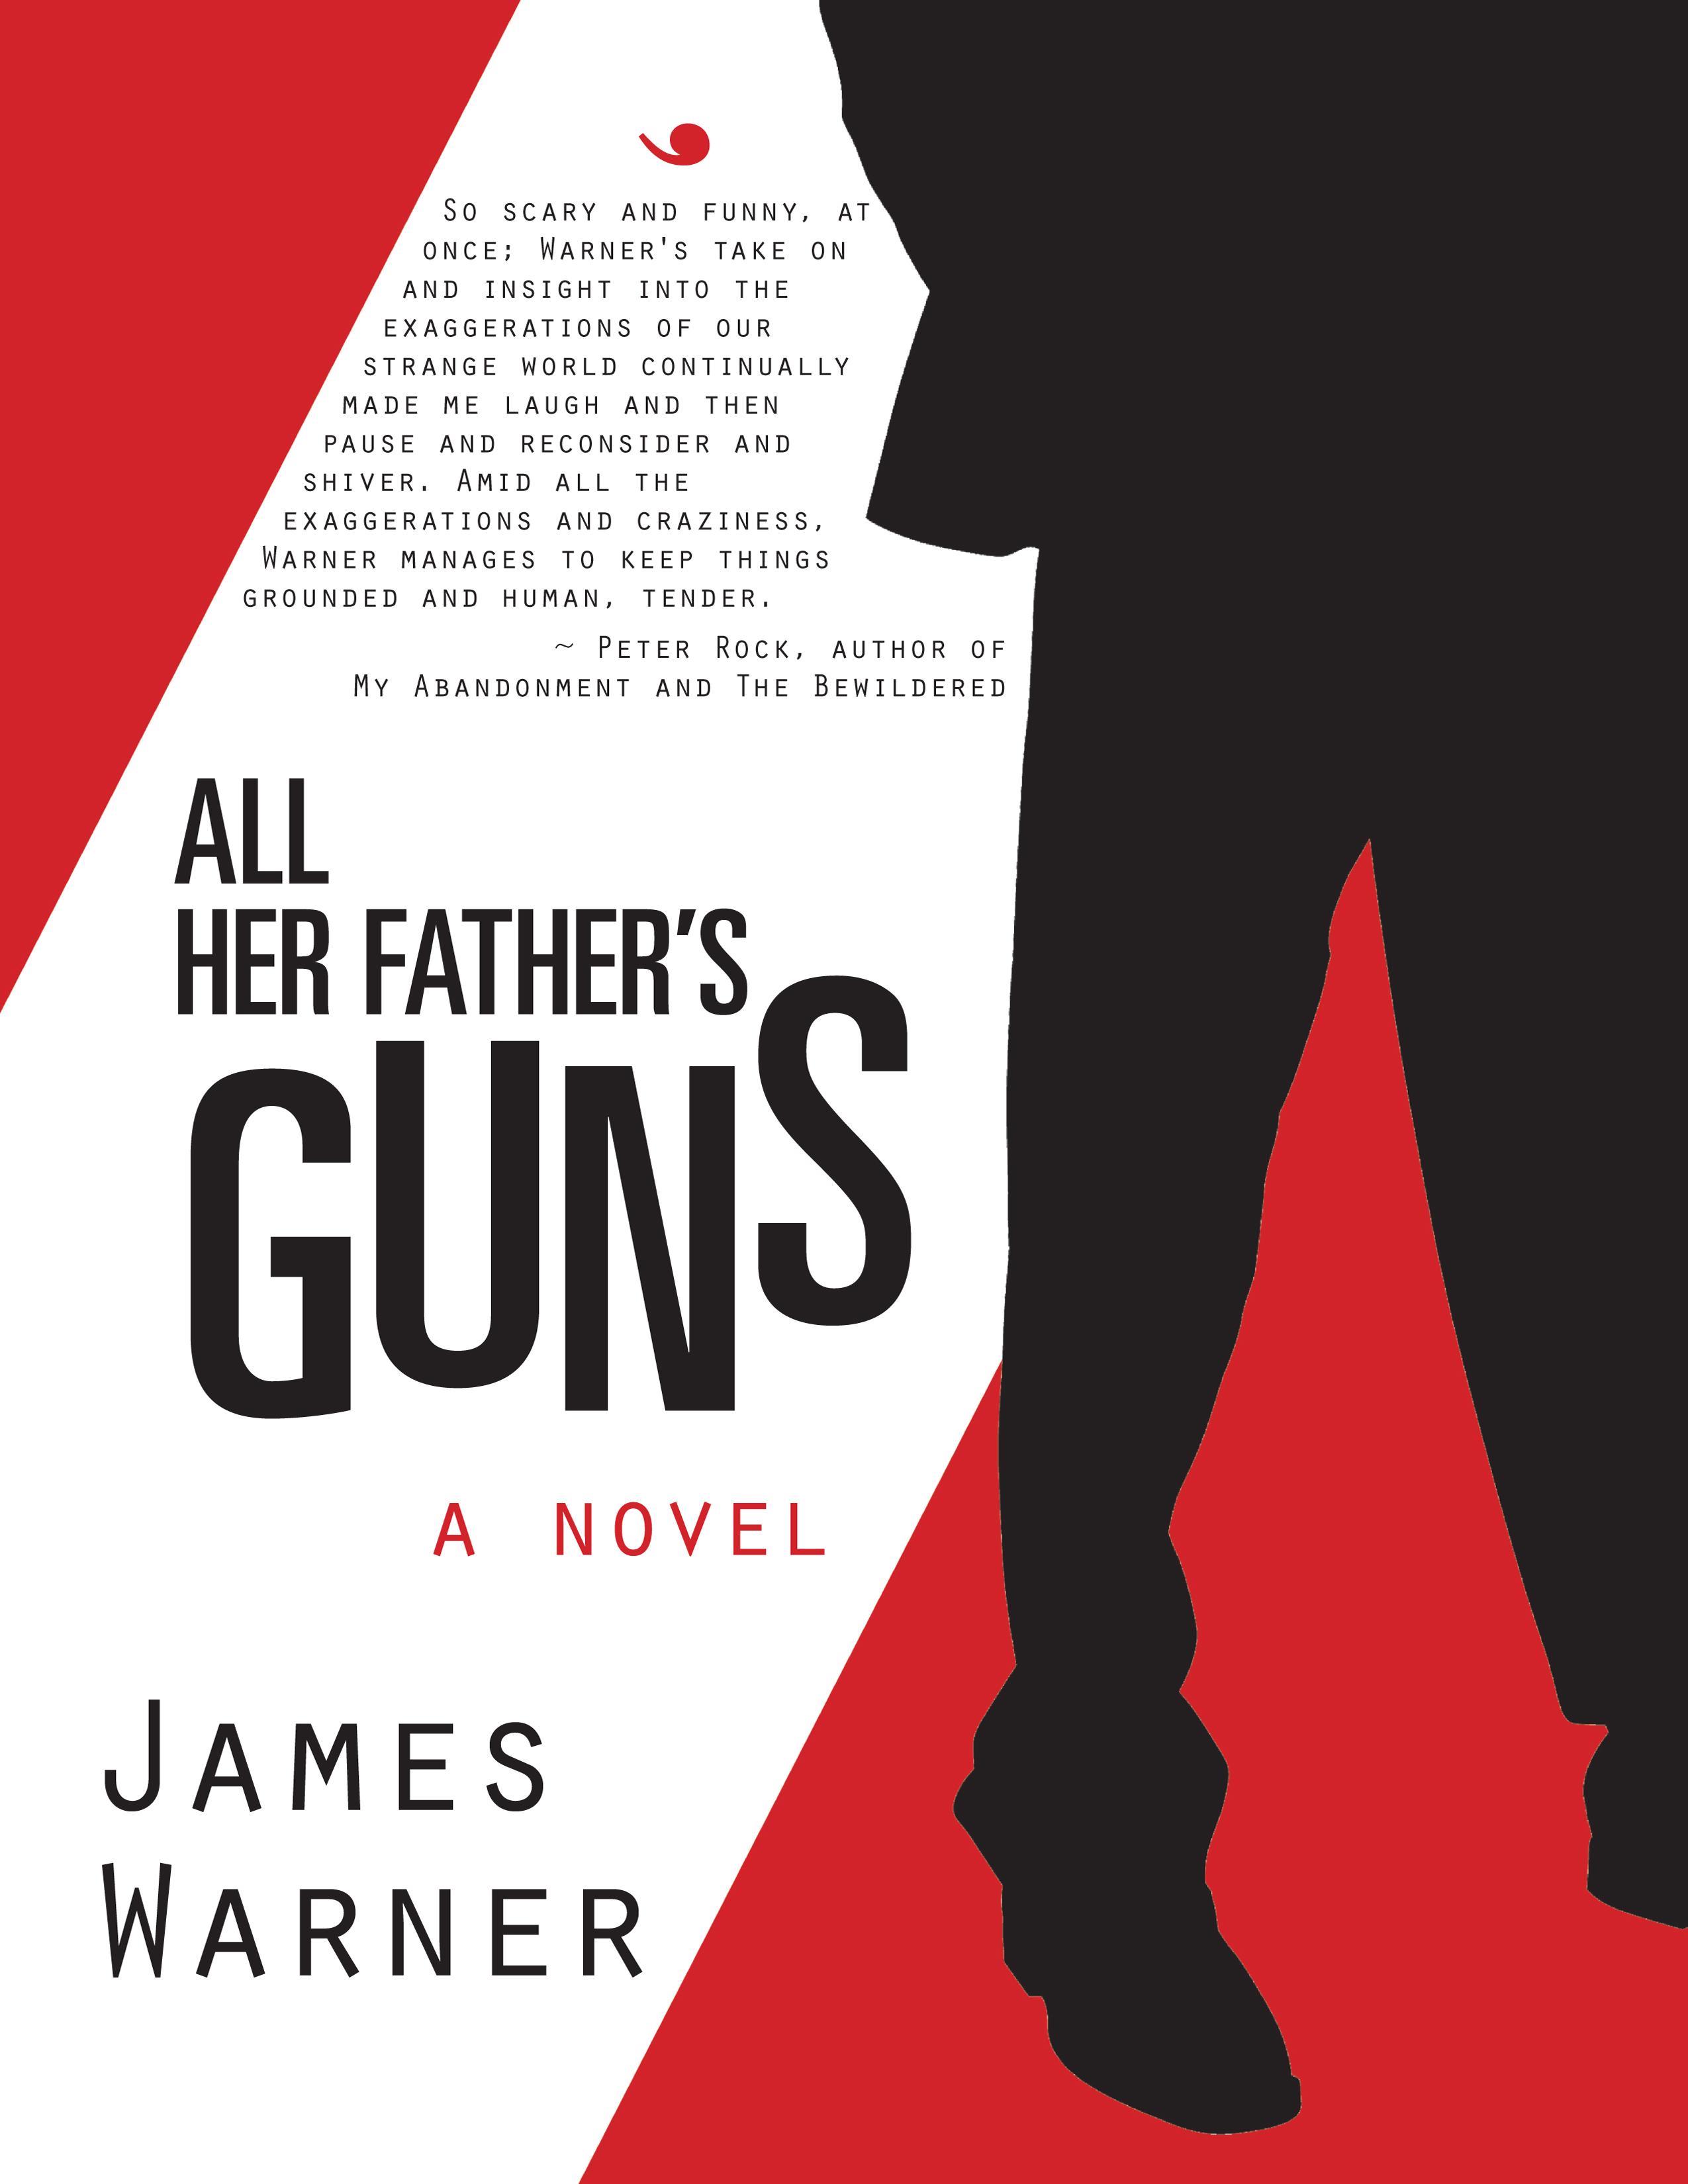 http://www.allherfathersguns.com/cover.jpg